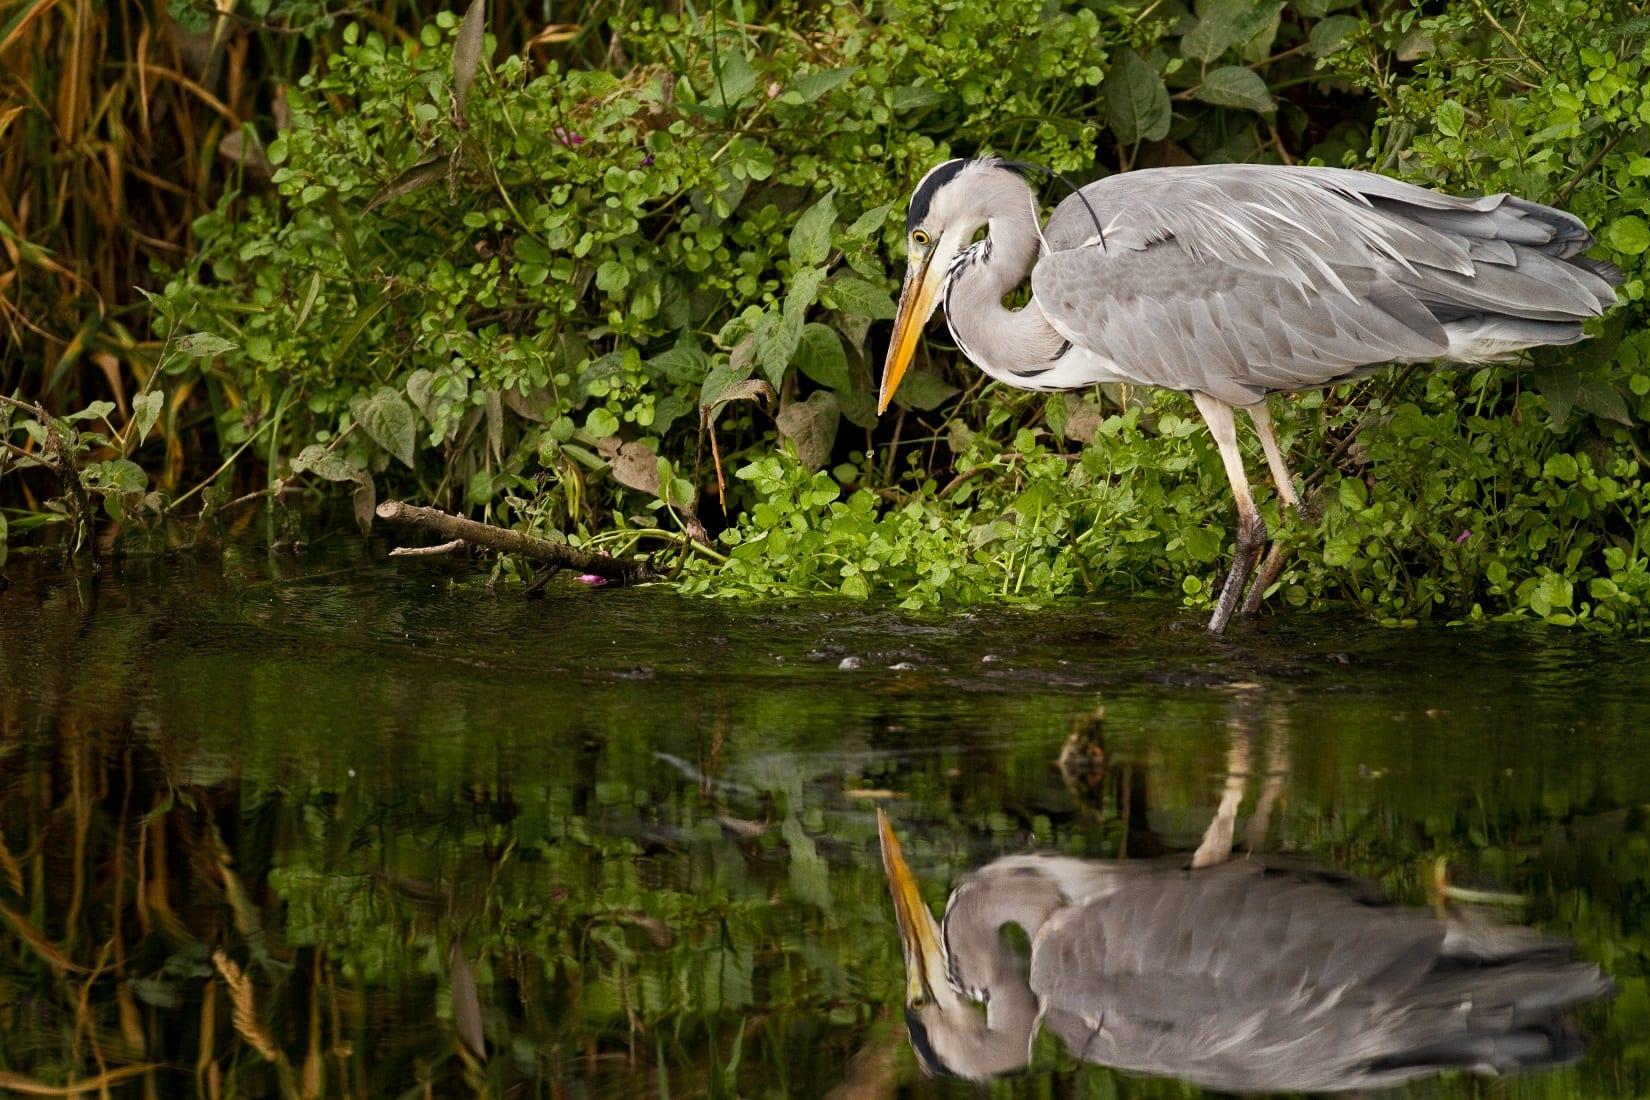 grey-heron-hunting-at-waters-edge